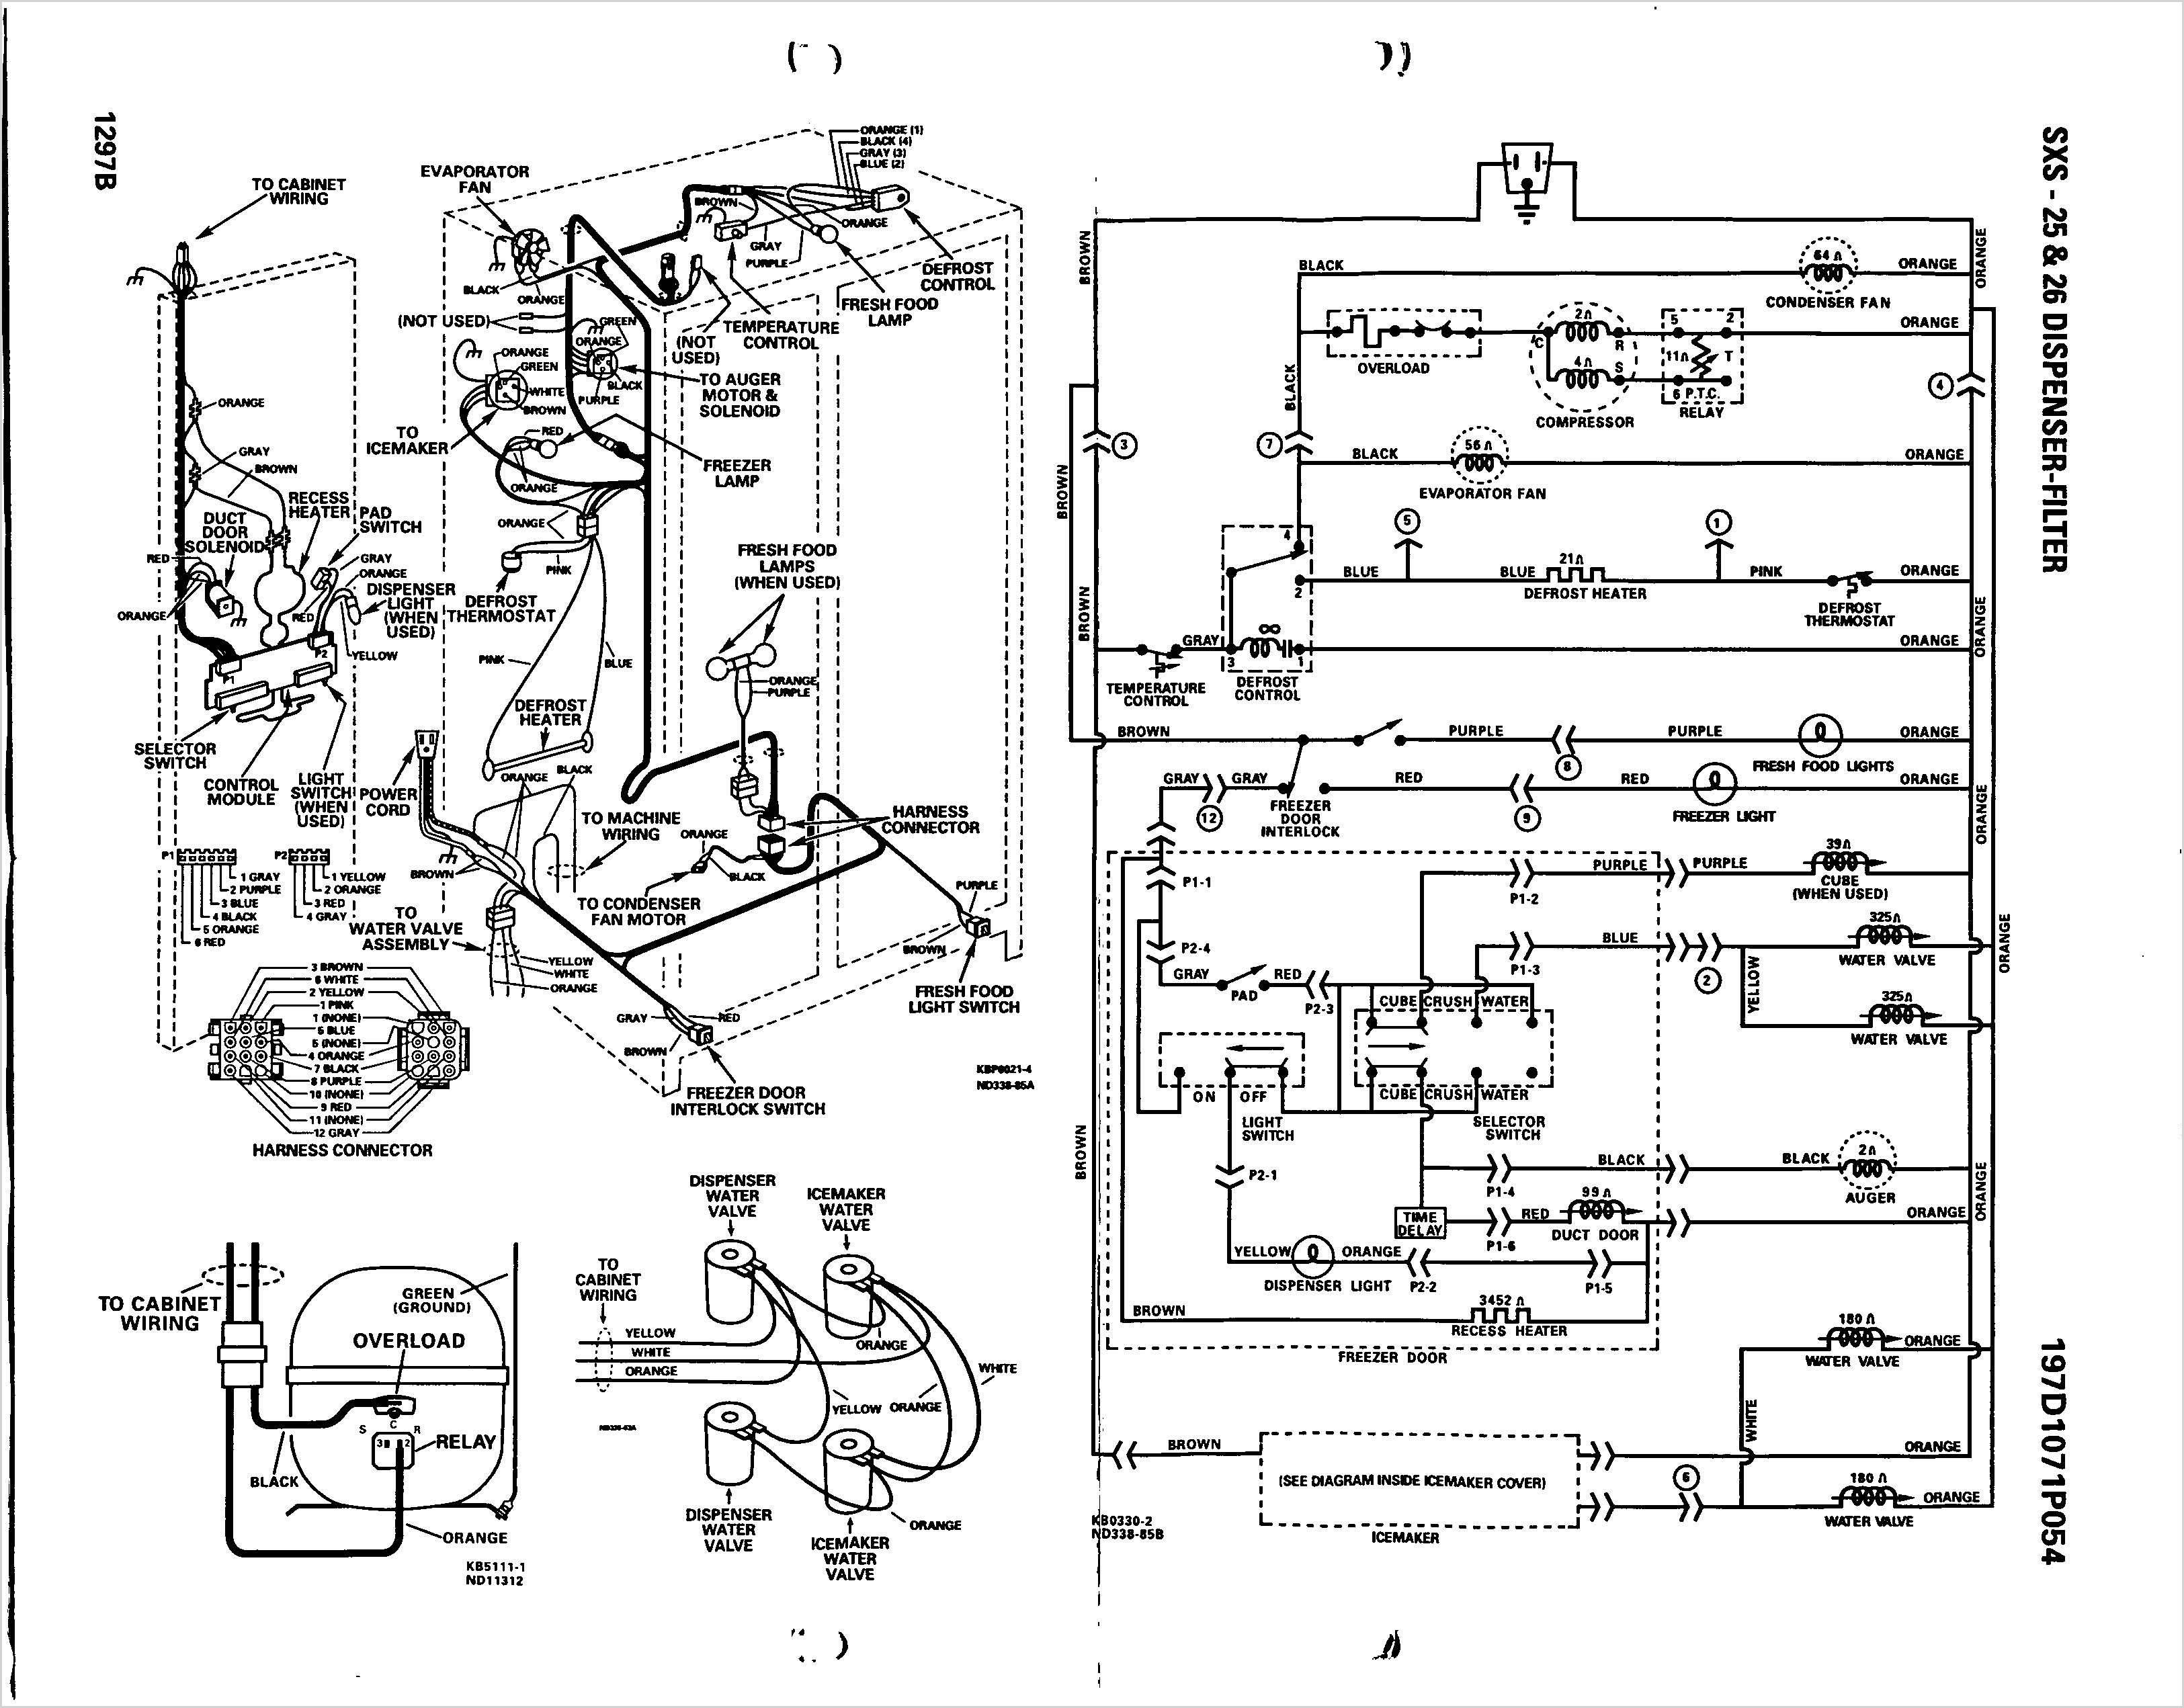 Samsung Dryer Dve G 50r5400 Wiring Diagrams Collection Samsung Refrigerator Wiring Diagram Sample Of Samsung Dryer Dve G 50r5400 Wiring Diagrams